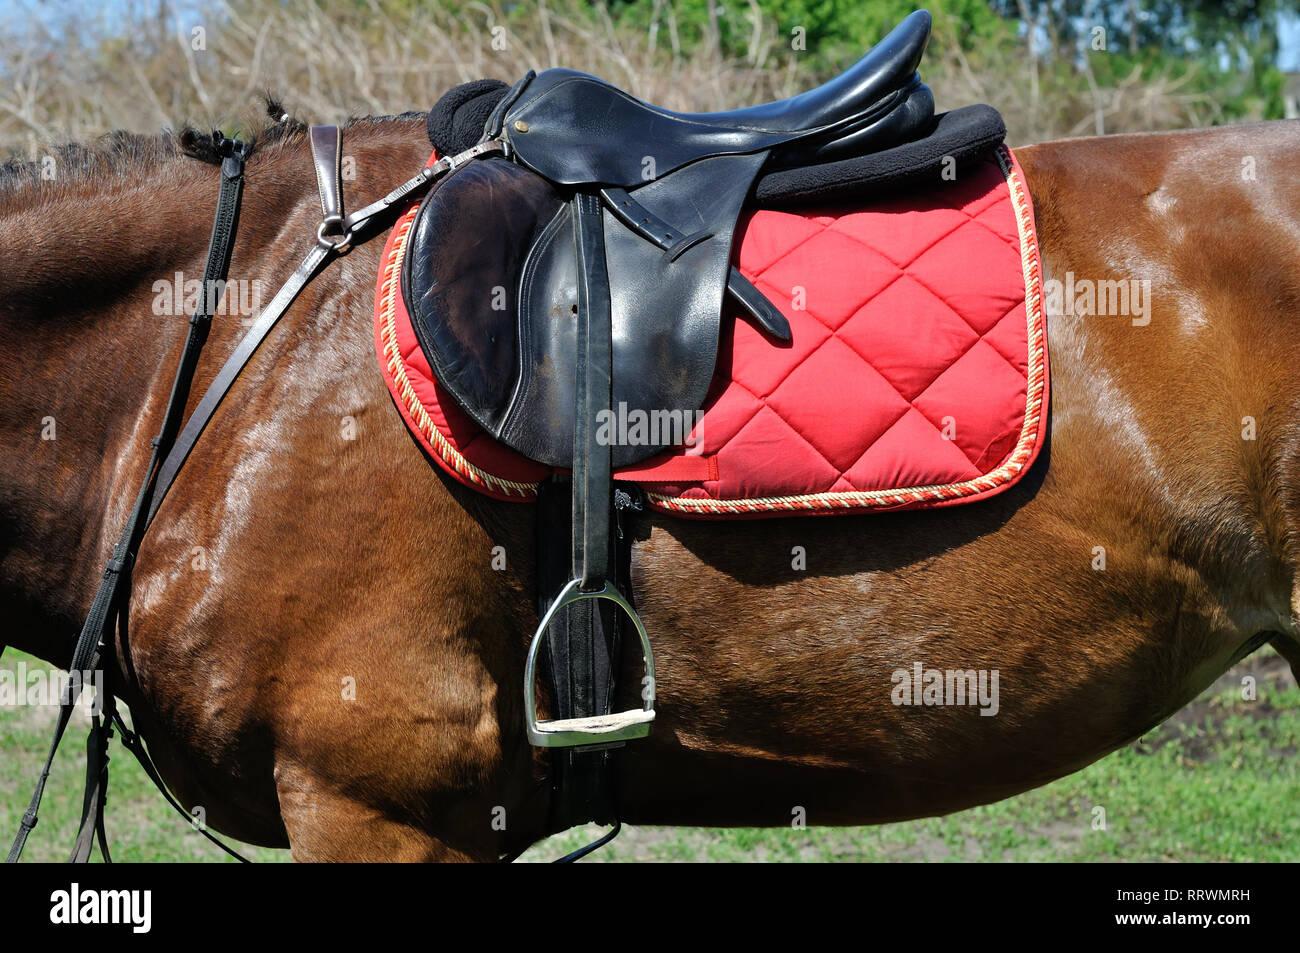 Cierre de un arnés de caballo, vista lateral Foto de stock